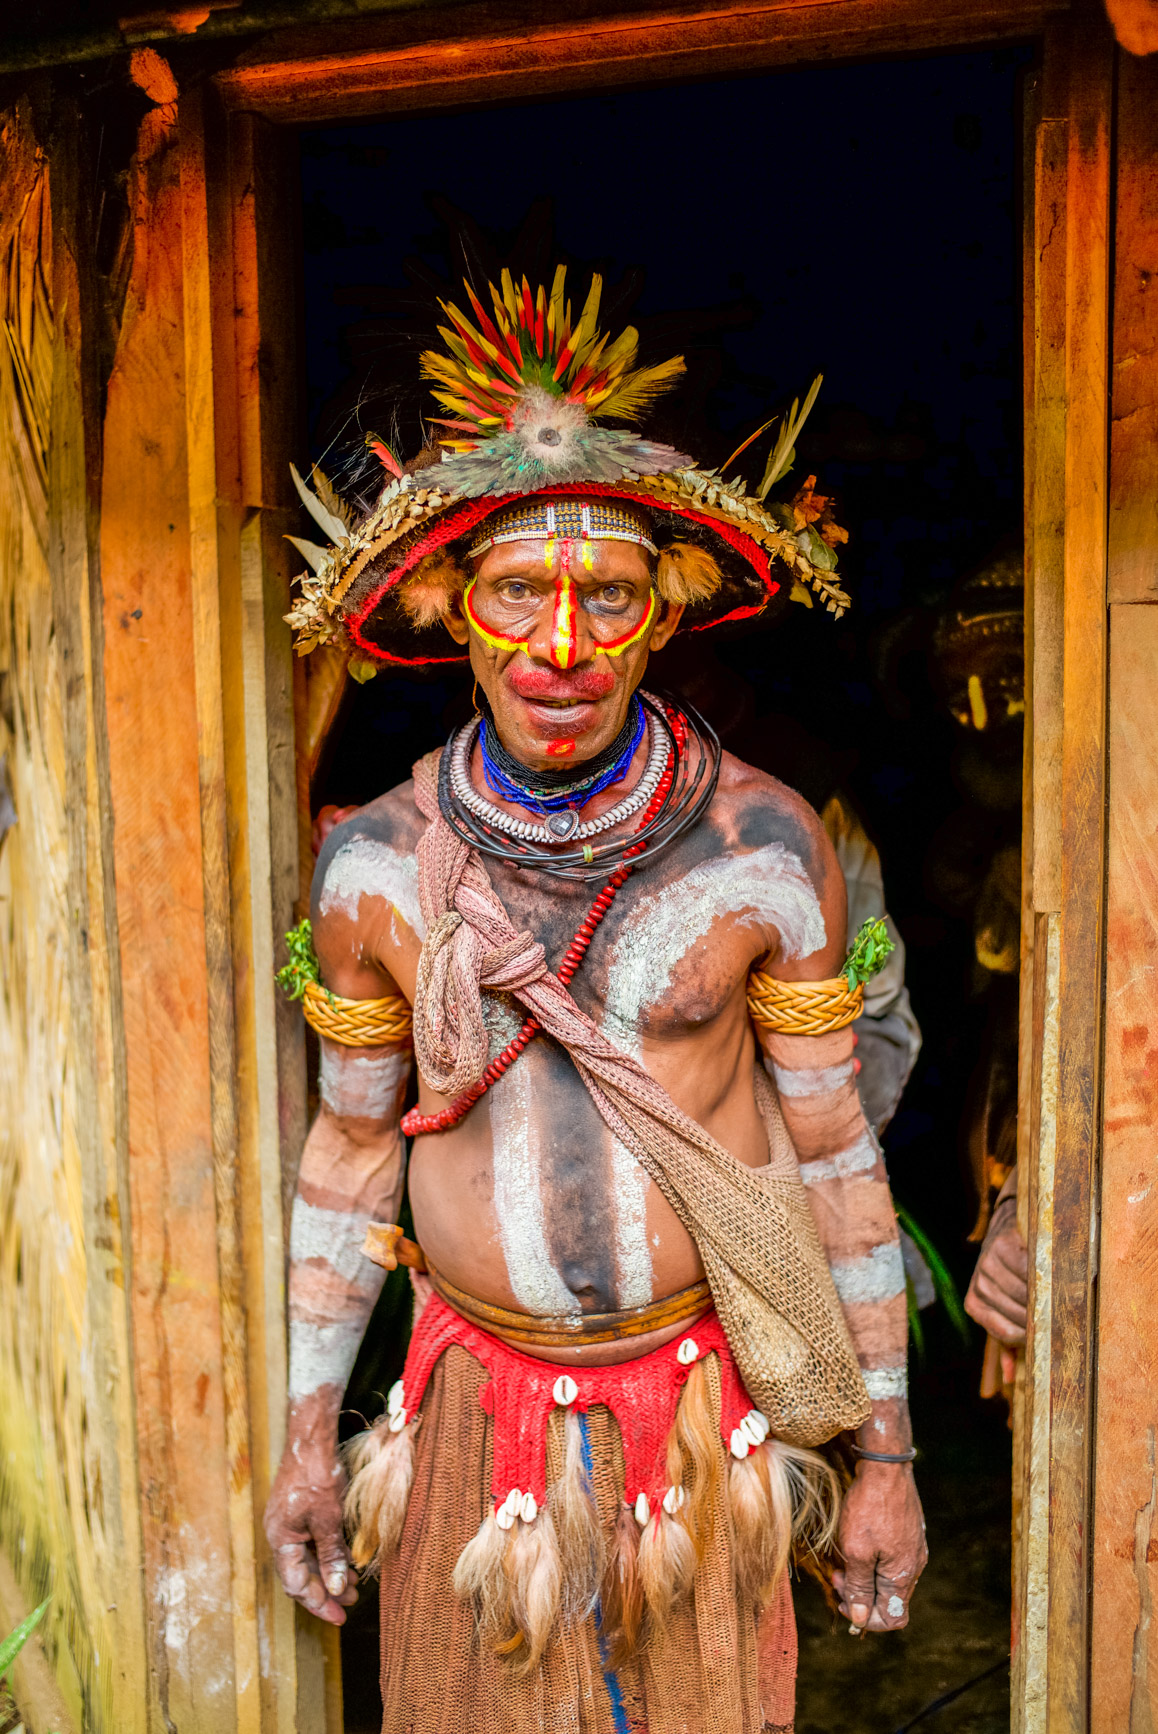 https://bubo.sk/uploads/galleries/7442/lubosfellner_papuanovaguinea_l1008040.jpg